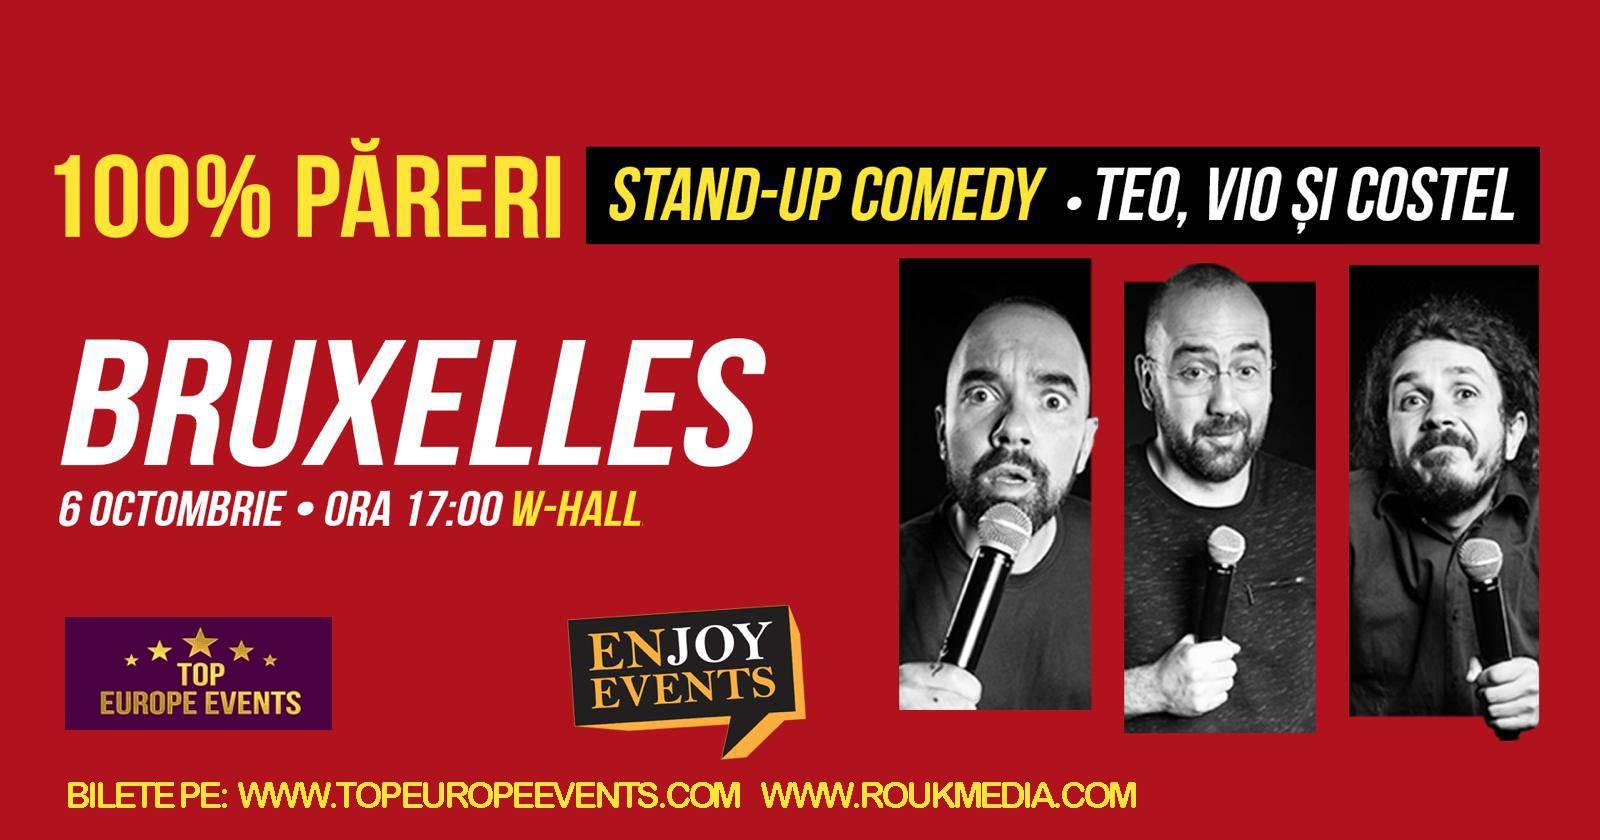 bruxelles standup comedy.jpg